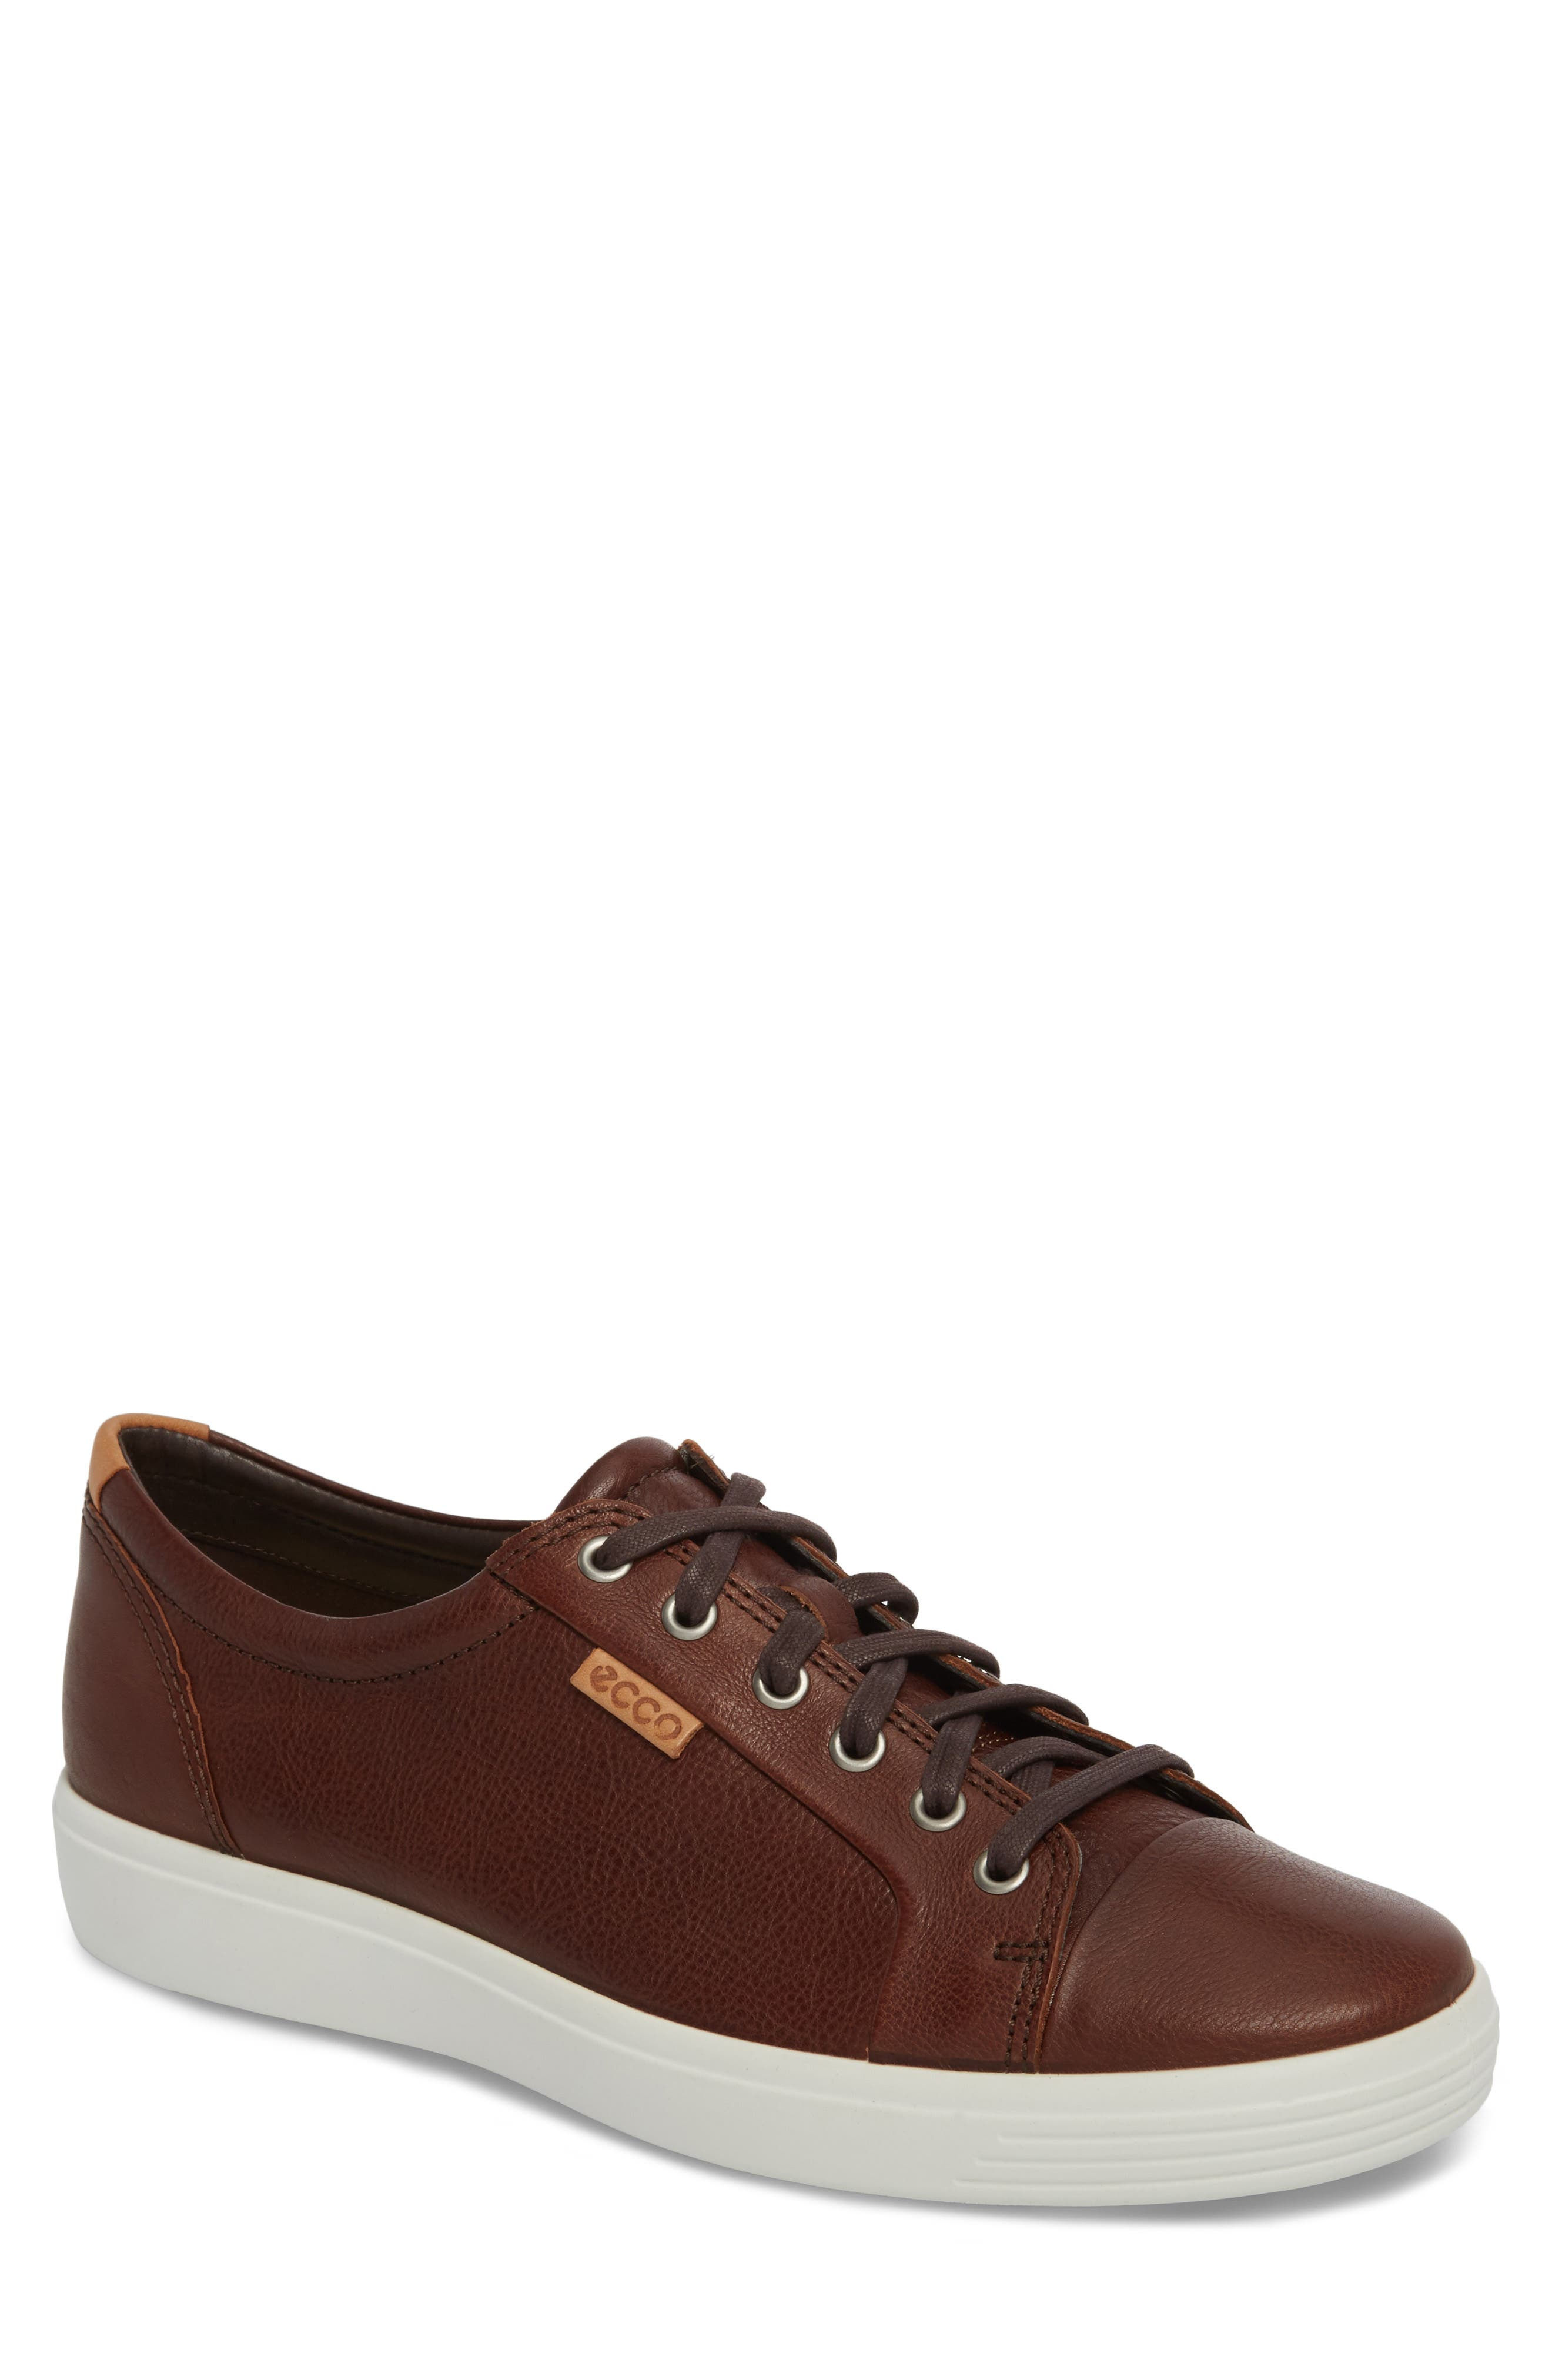 Men's Ecco Soft Vii Lace-Up Sneaker